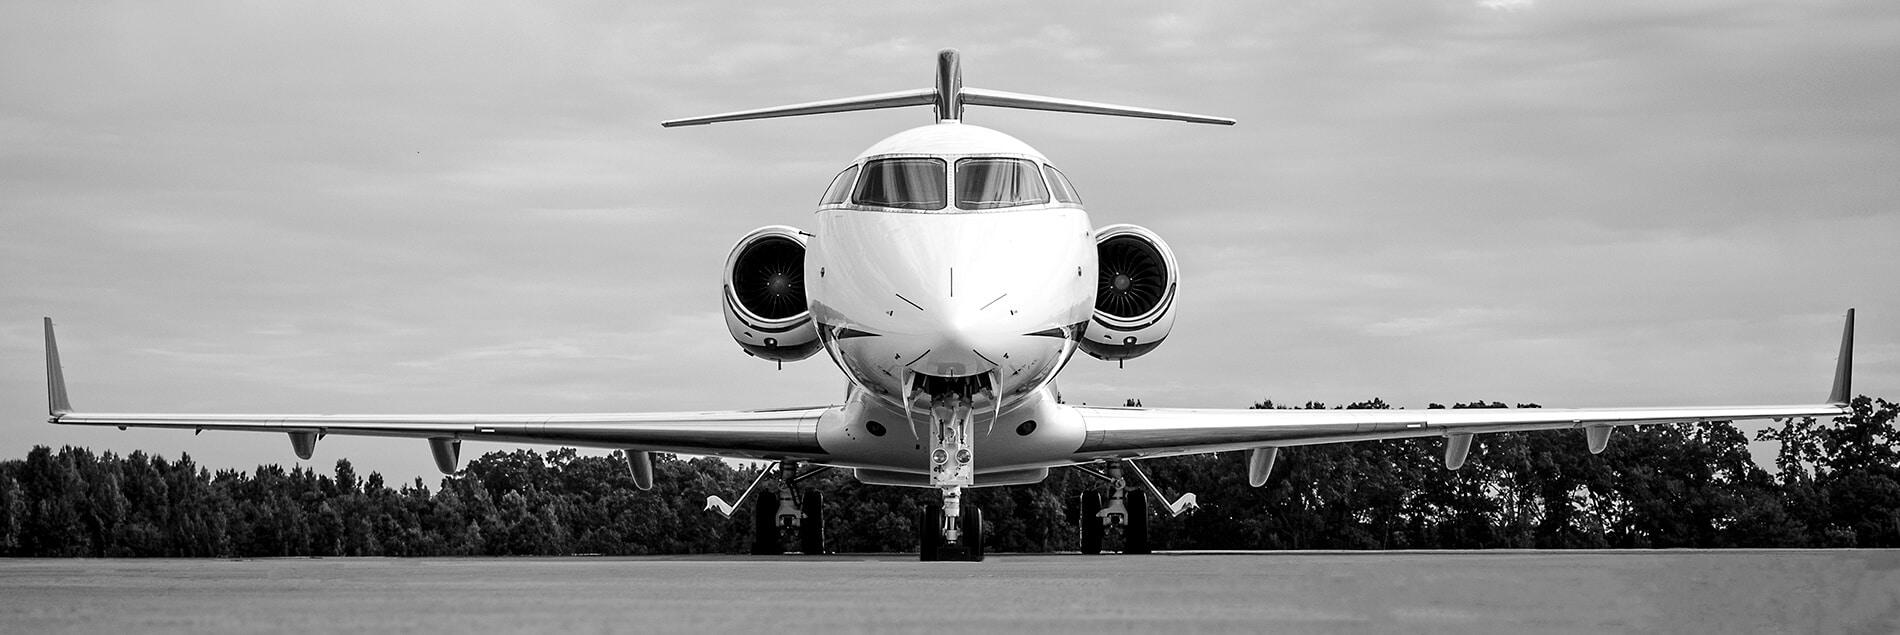 Bombardier Challenger 300 Black & White Photo